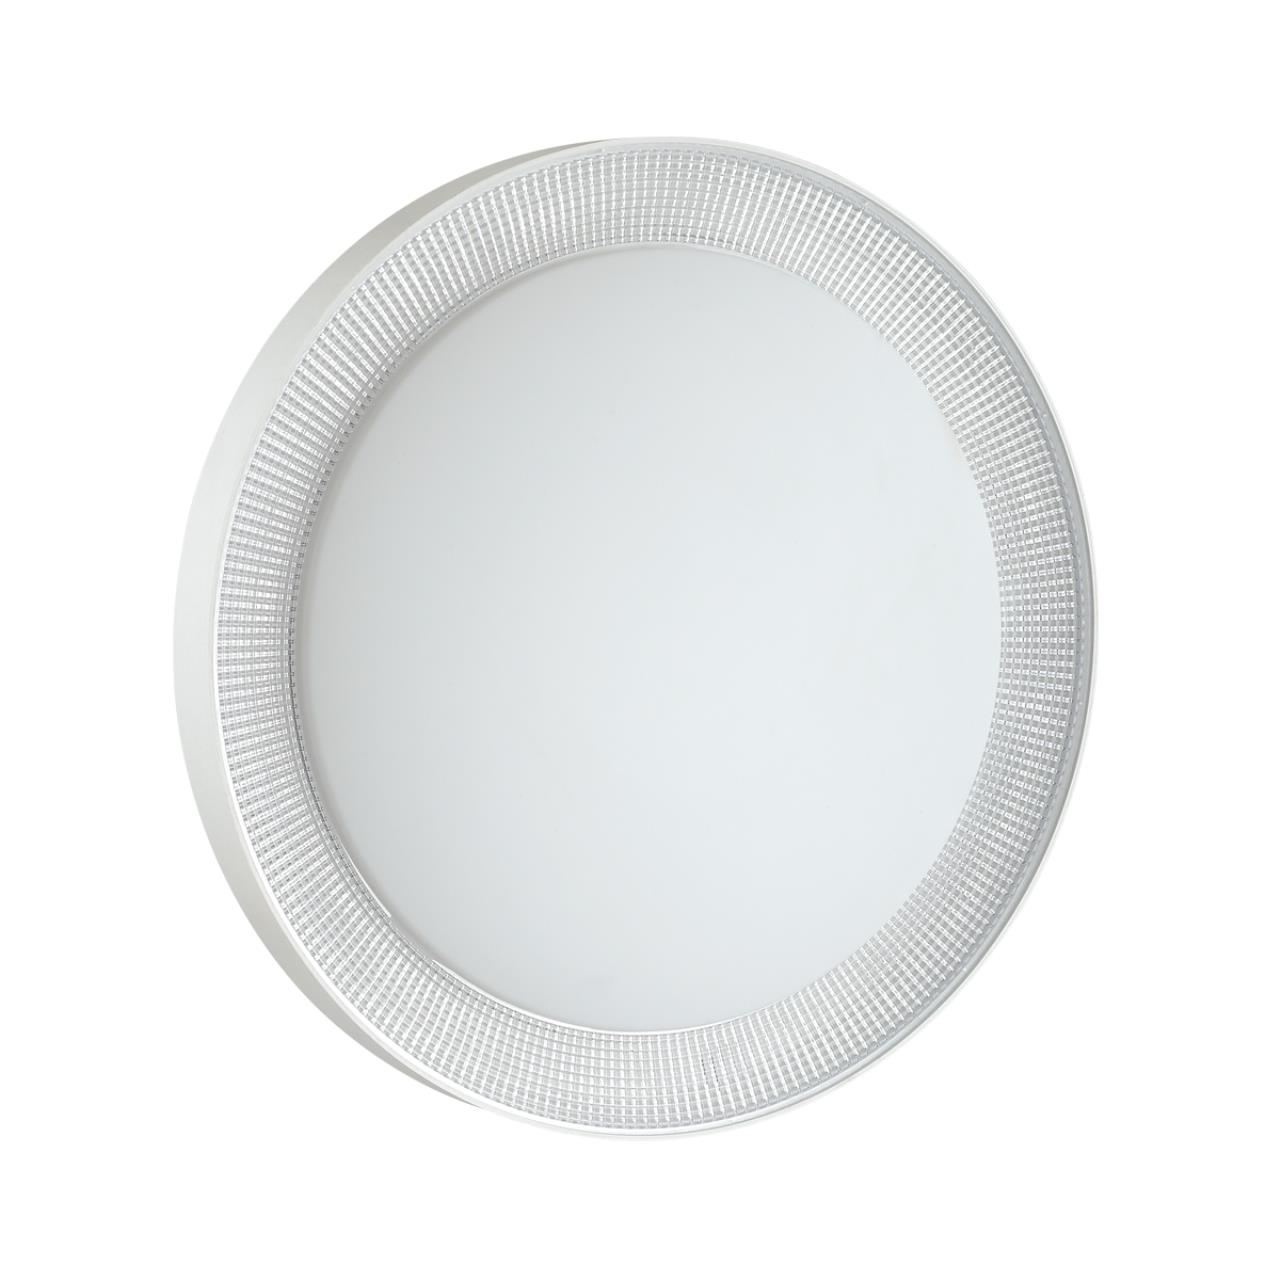 3031/DL SN 015 св-к ASUNO пластик LED 48Вт 3000-6000K D450 IP43 пульт ДУ